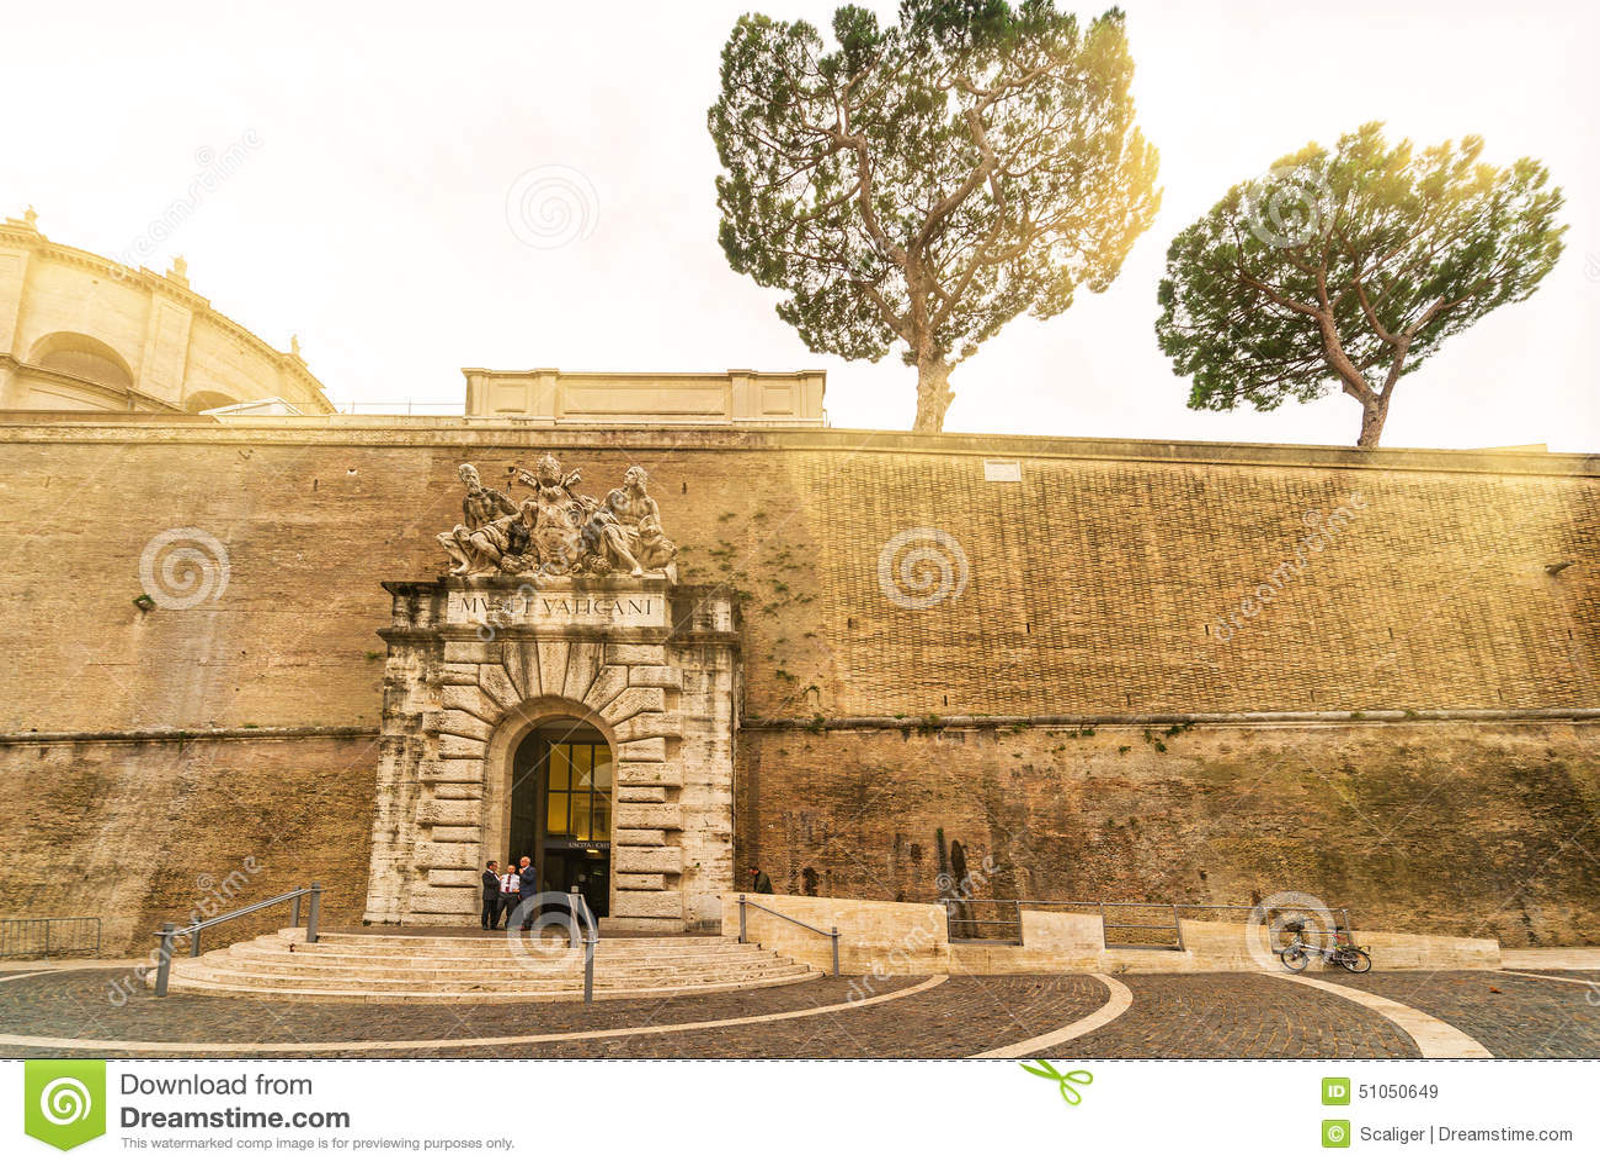 Museo famoso del Vaticano en Roma